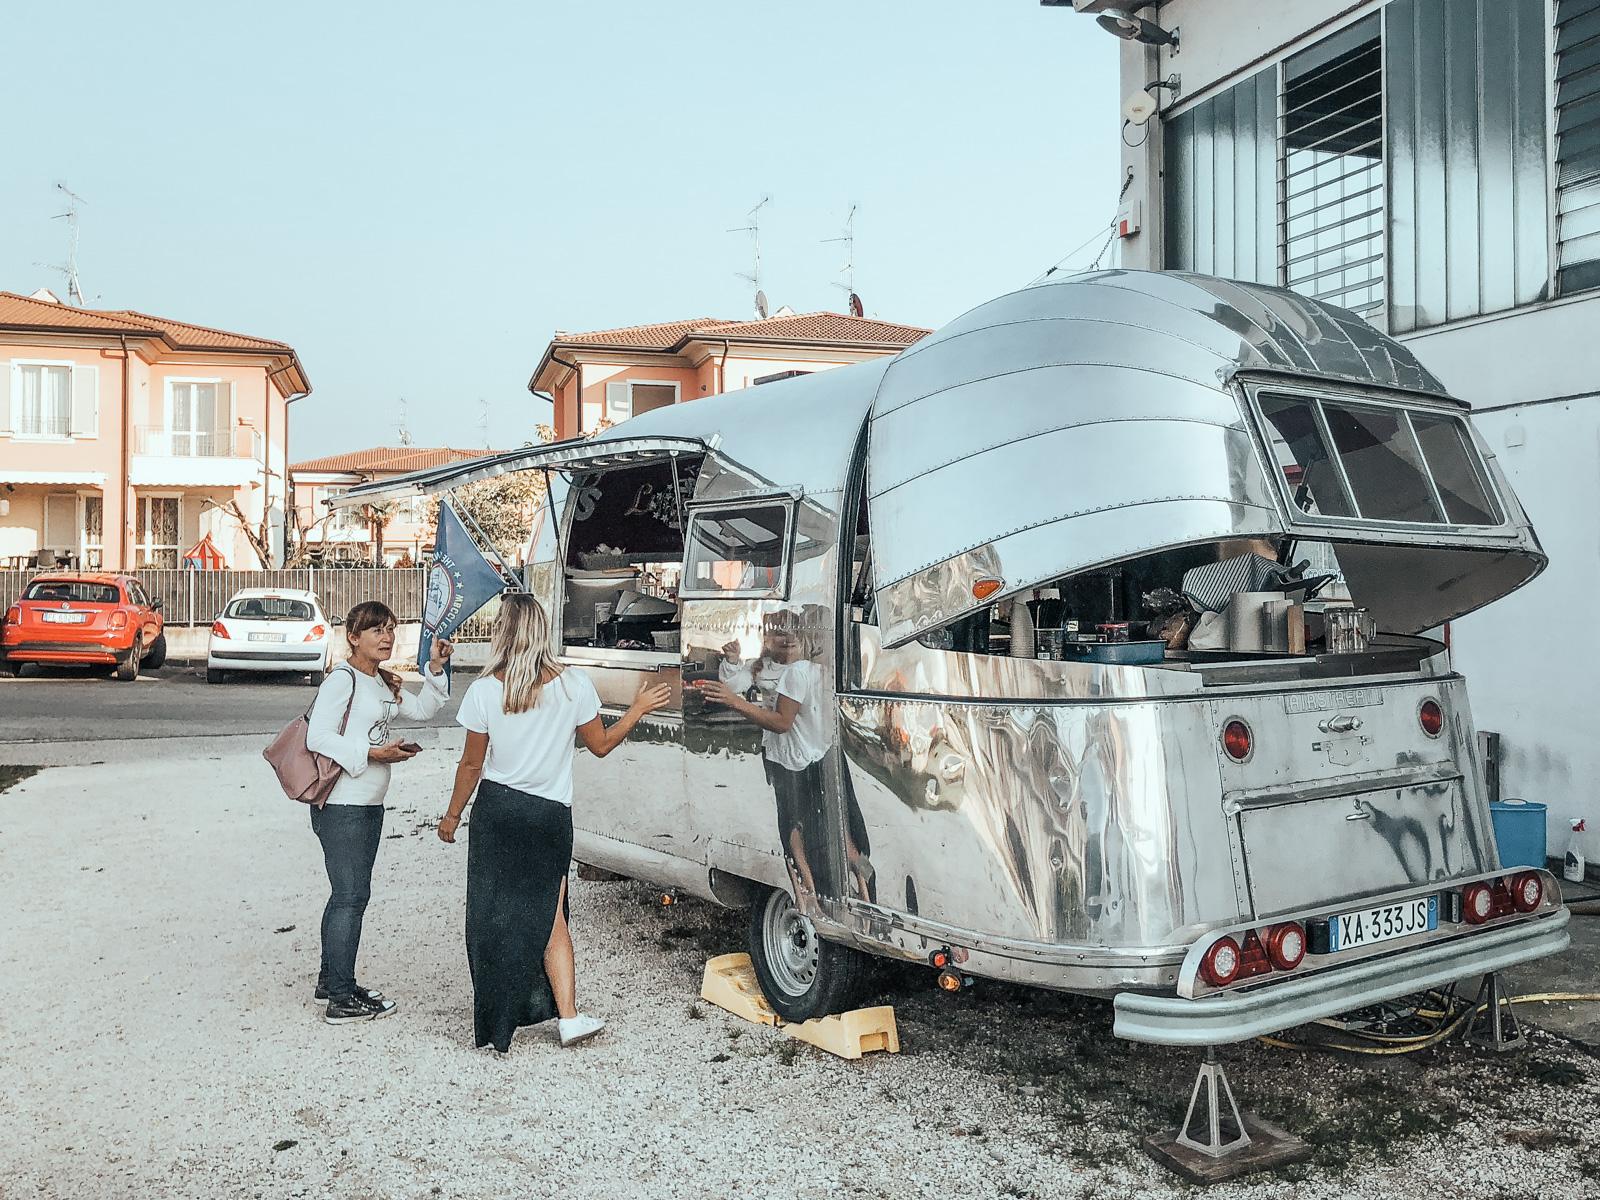 American style at lake Garda in Italy - Two Modern Gypsies